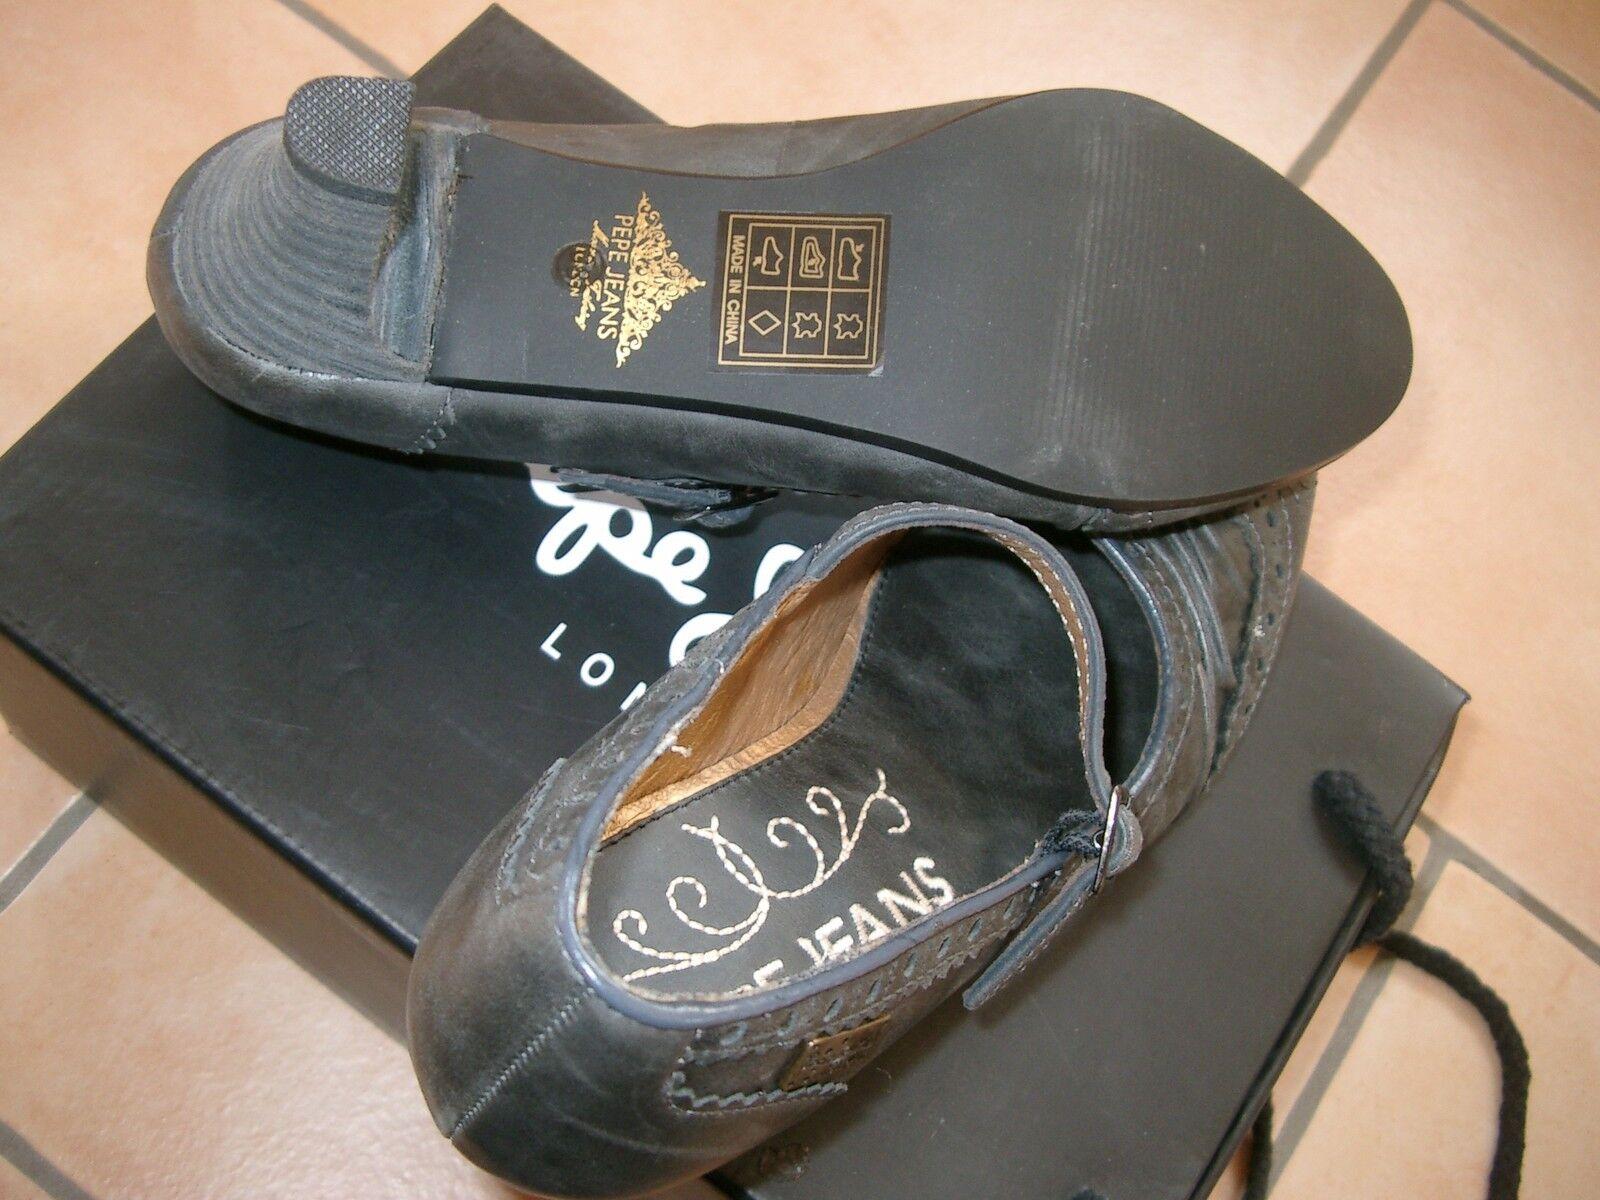 (Z41) Lyra Pepe Jeans London Damen Leder Schuhe Pumps mit Lyra (Z41) Lochung & Riemen gr.37 85337d